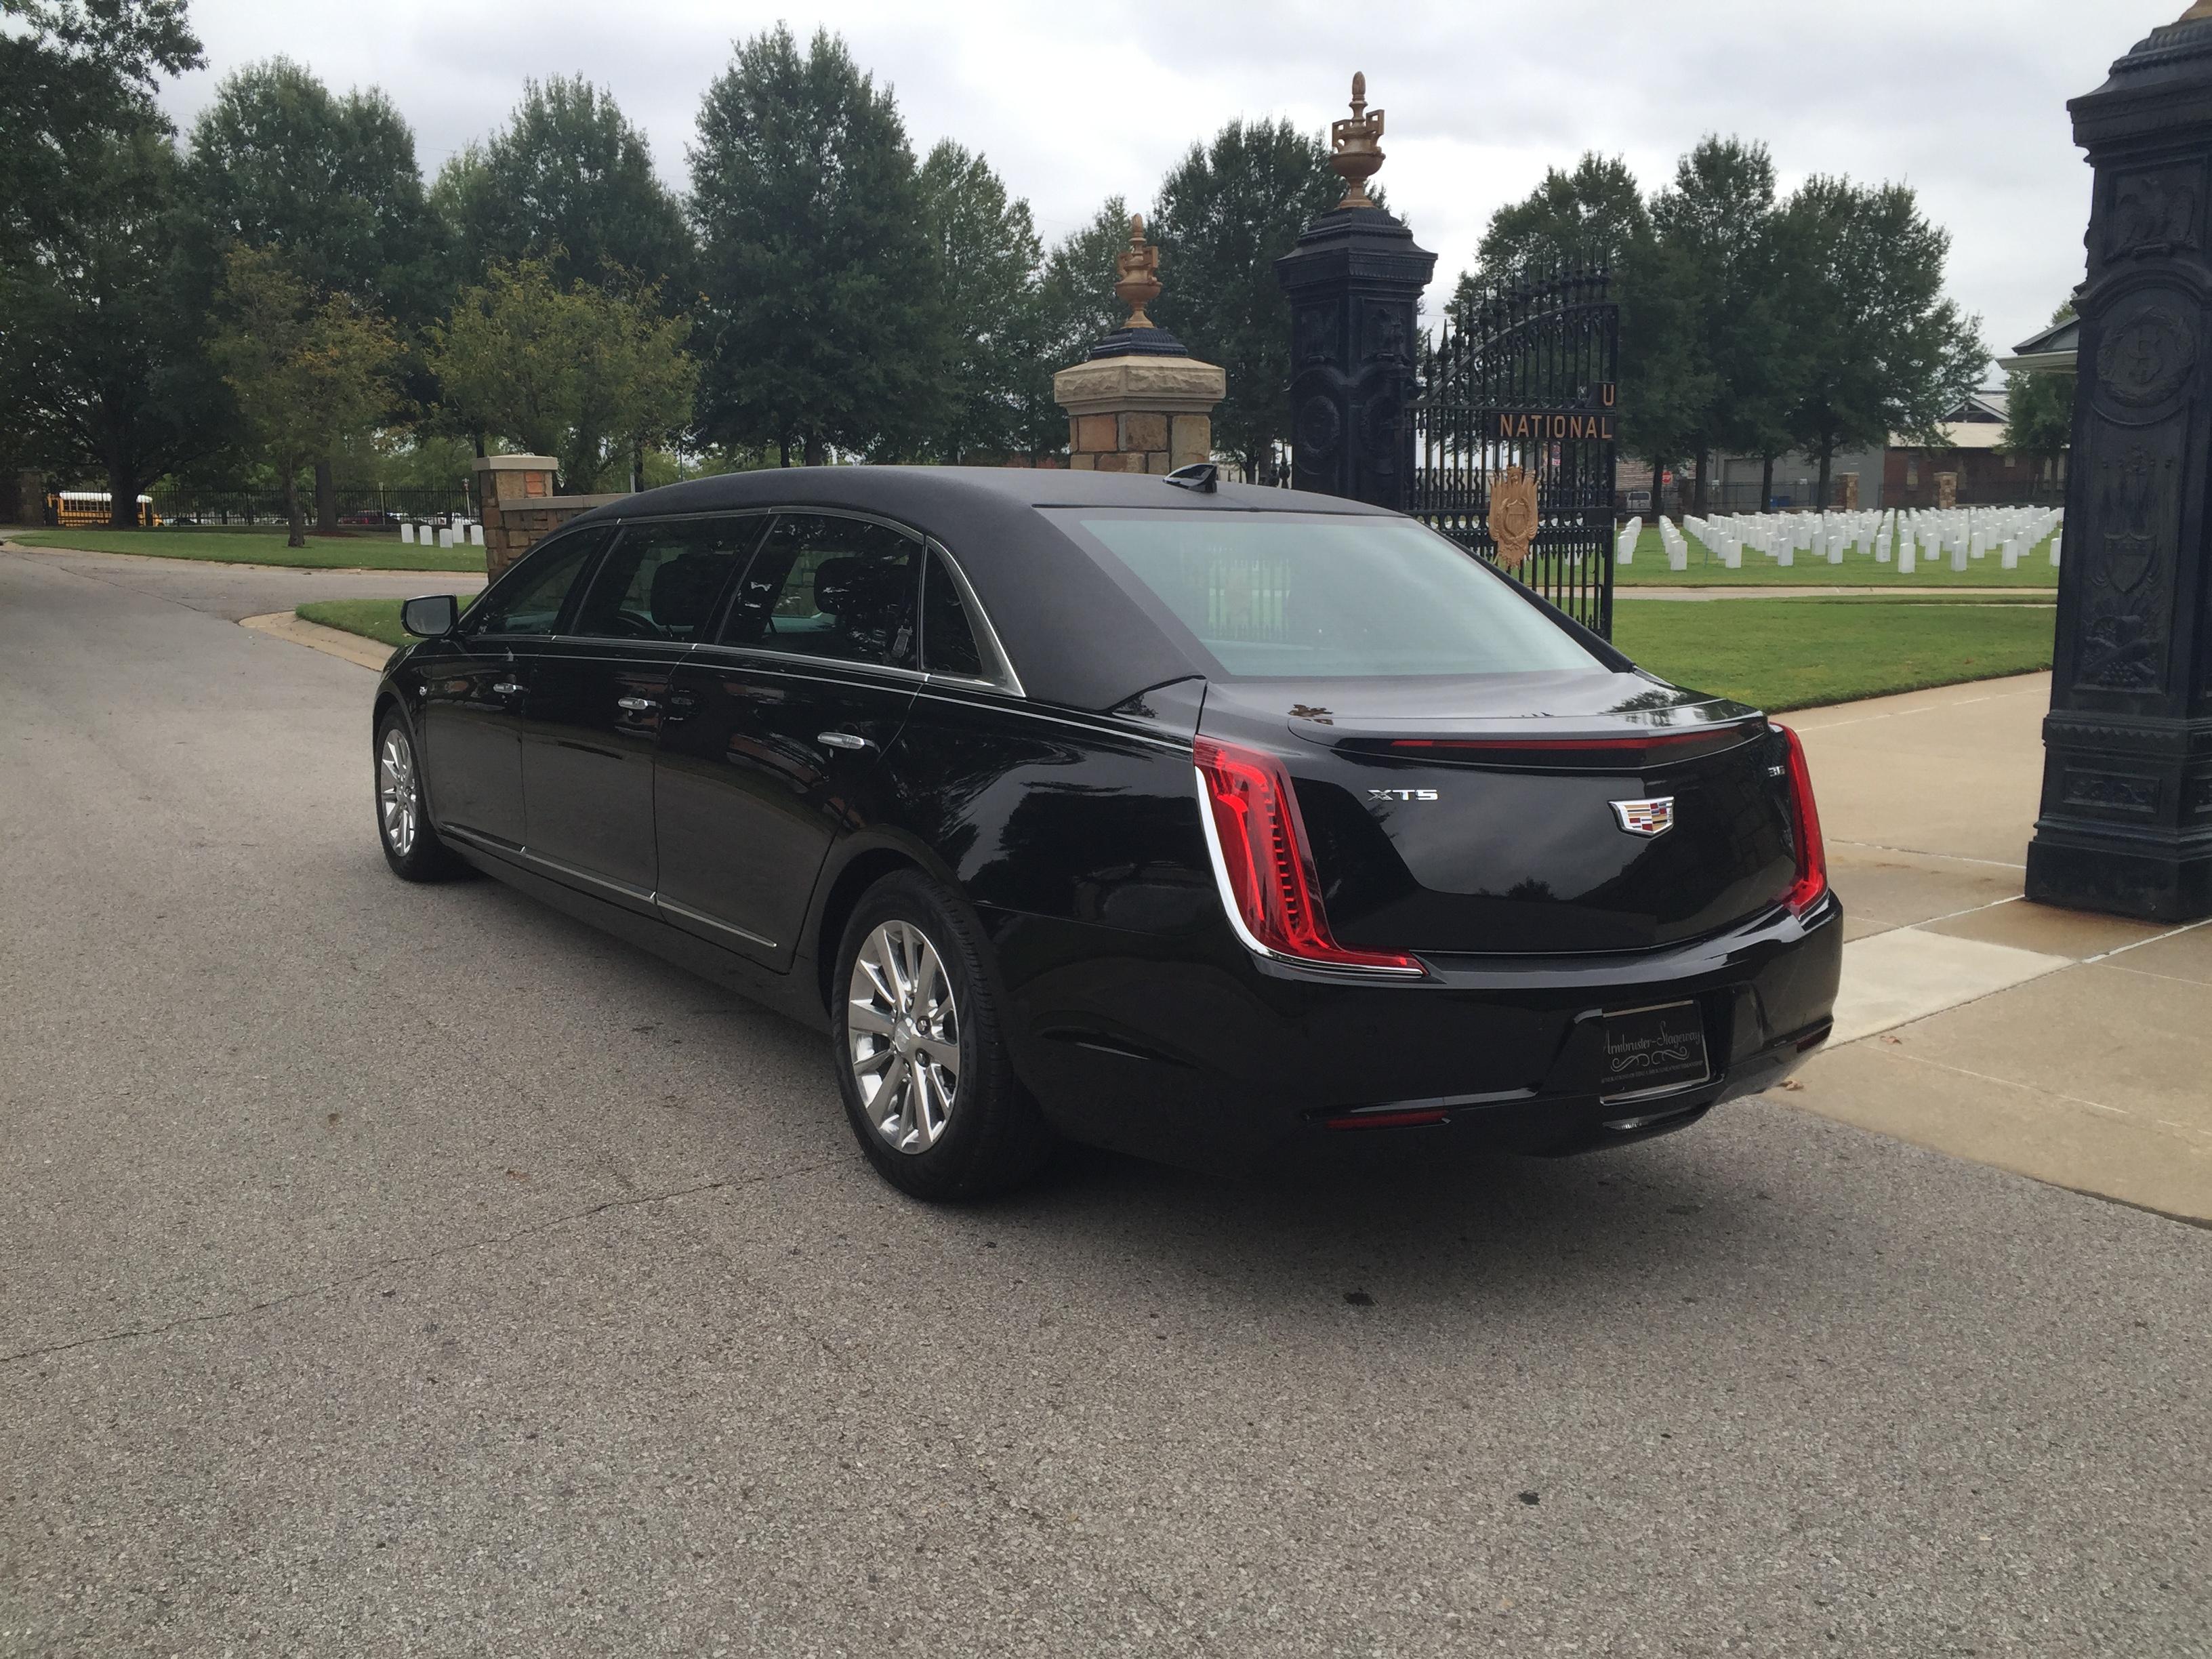 2018 Cadillac Armbruster Stageway Six Door Limousine for Sale 16 & XTS-L6 - Armbruster Stageway - Limousine For Sale